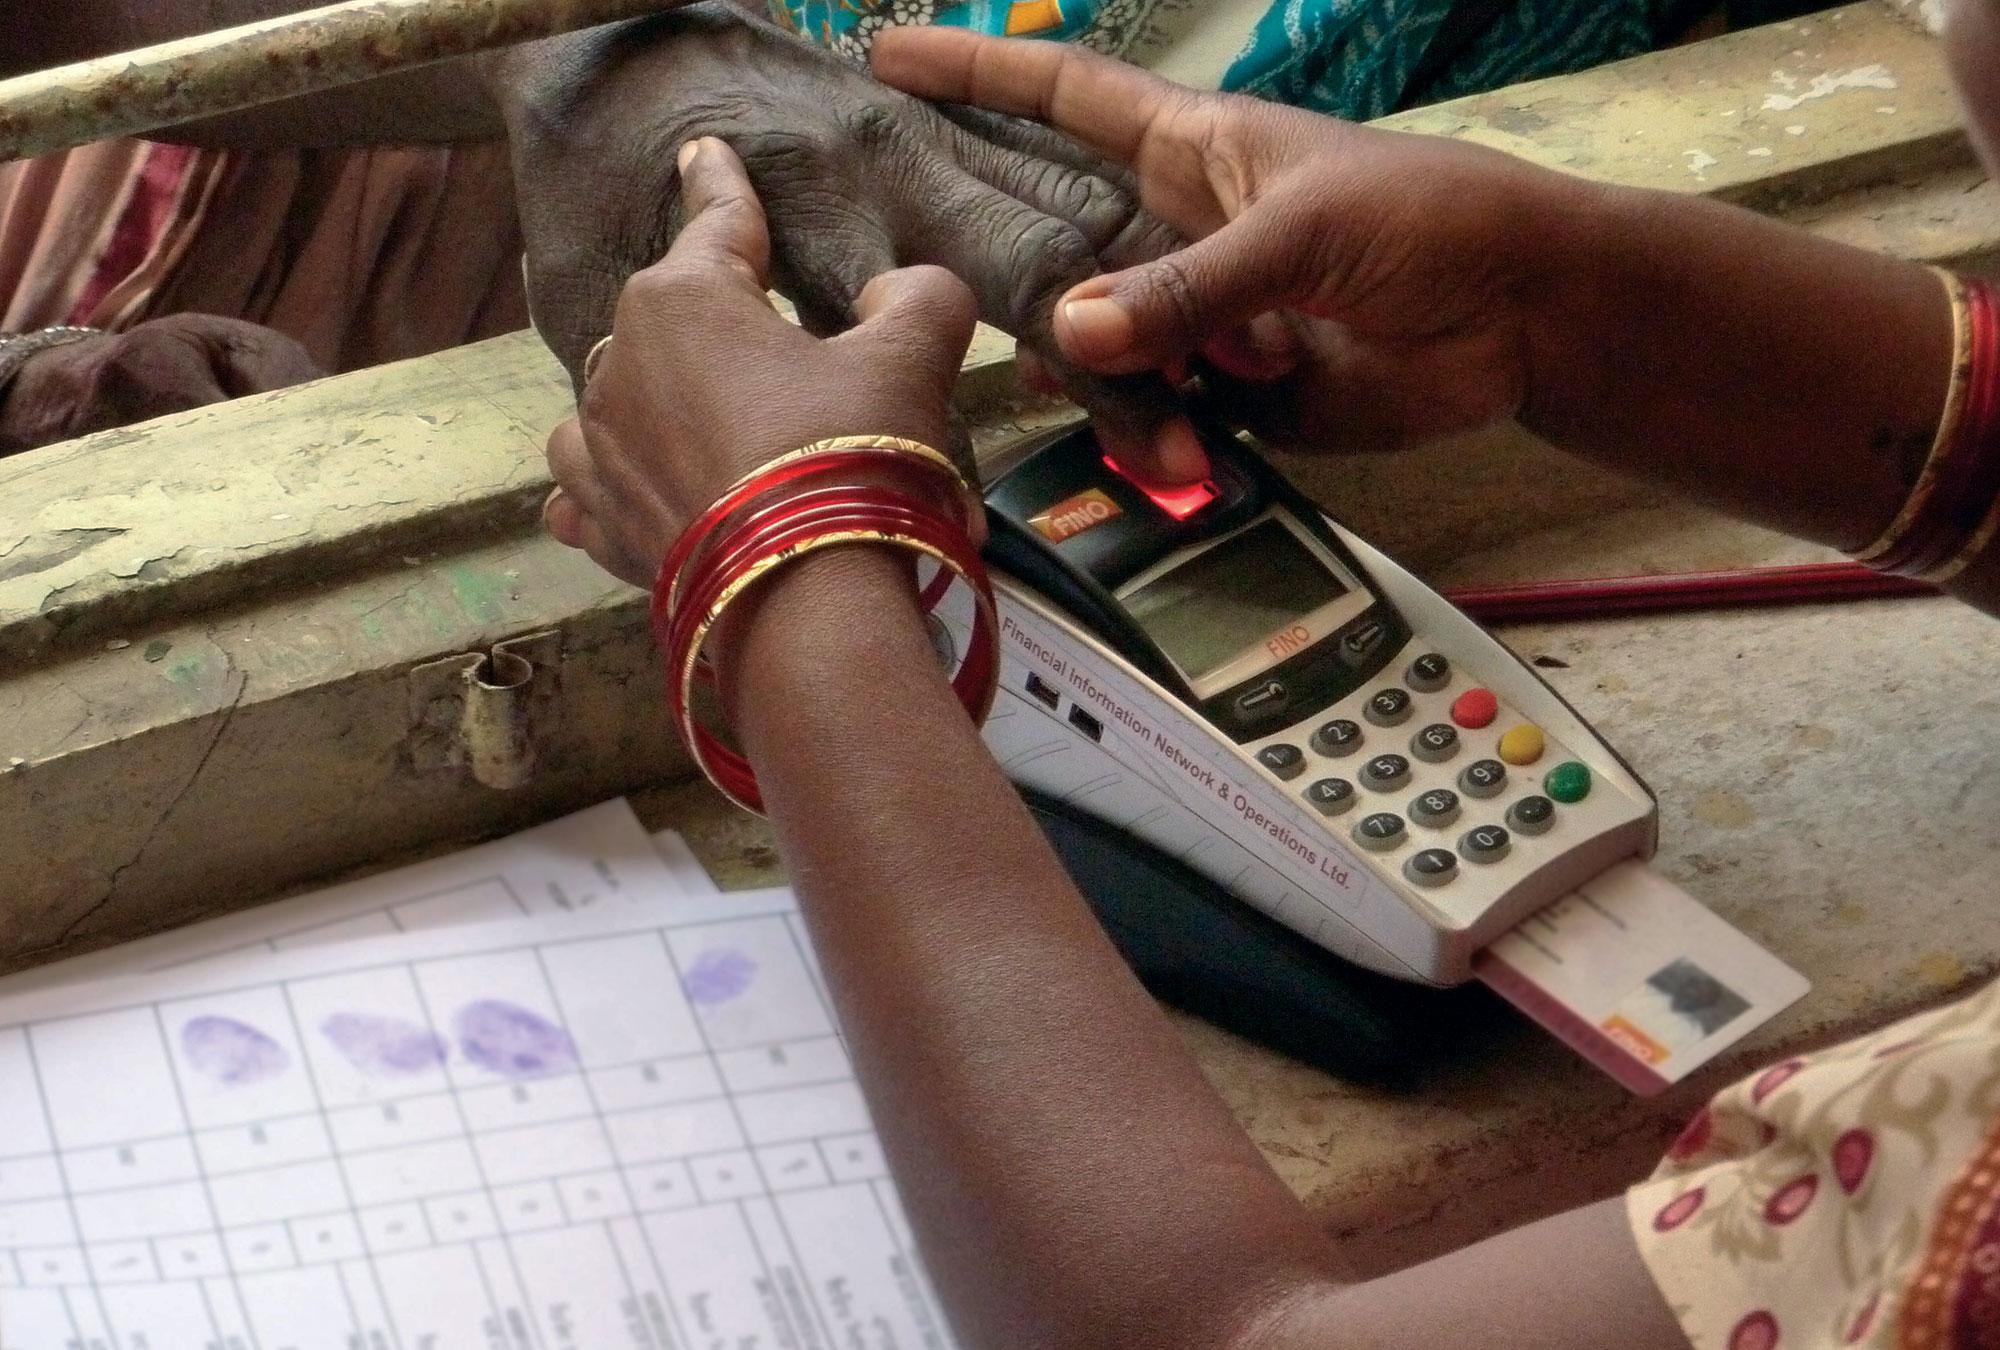 Biometric authentication using thumbprint